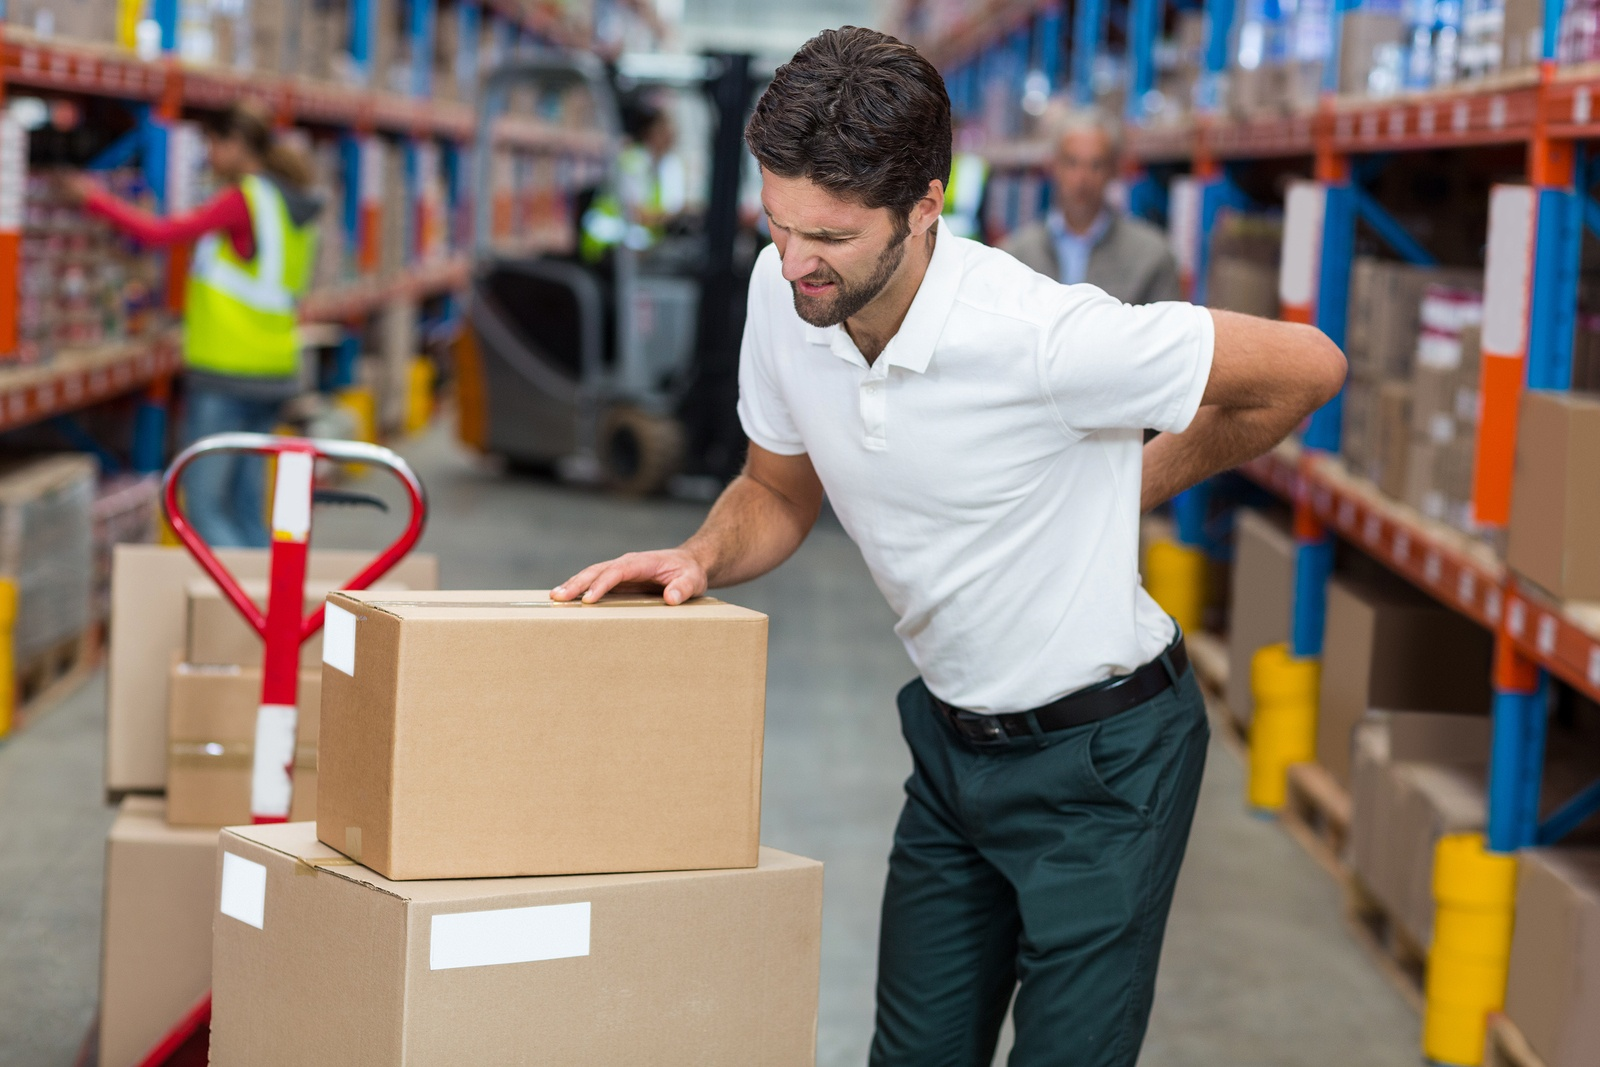 bigstock-Focus-of-worker-having-a-backa-139454861